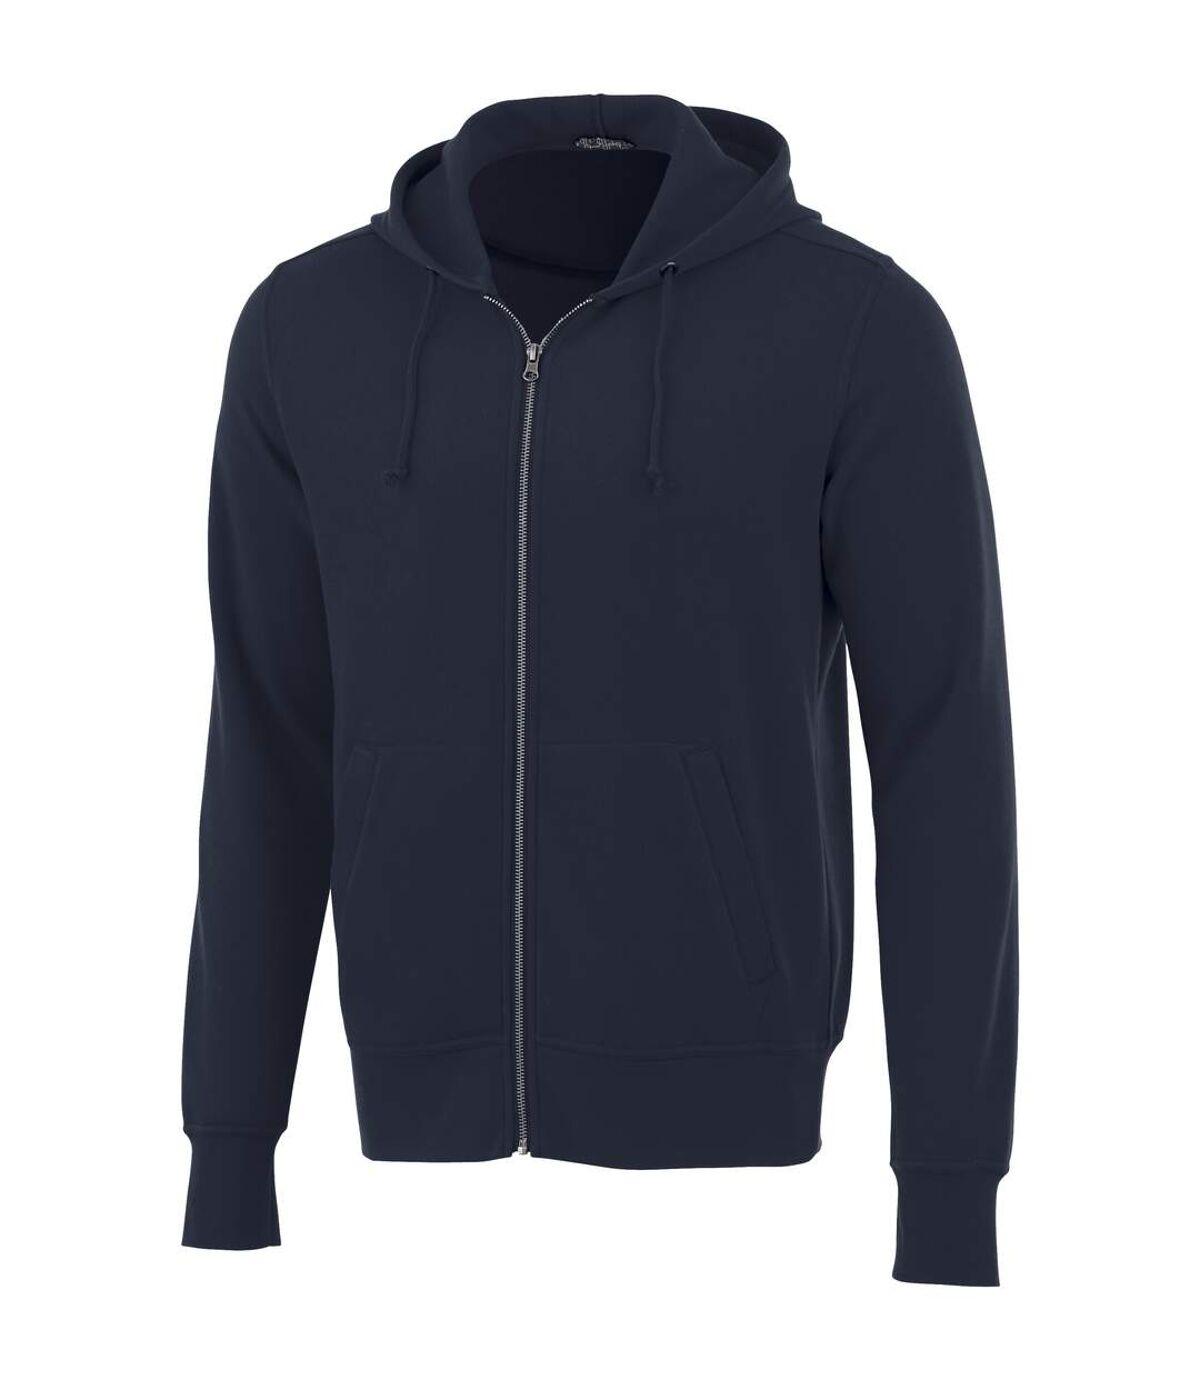 Elevate - Sweat à capuche Cypress - Homme (Rouge) - UTPF1860